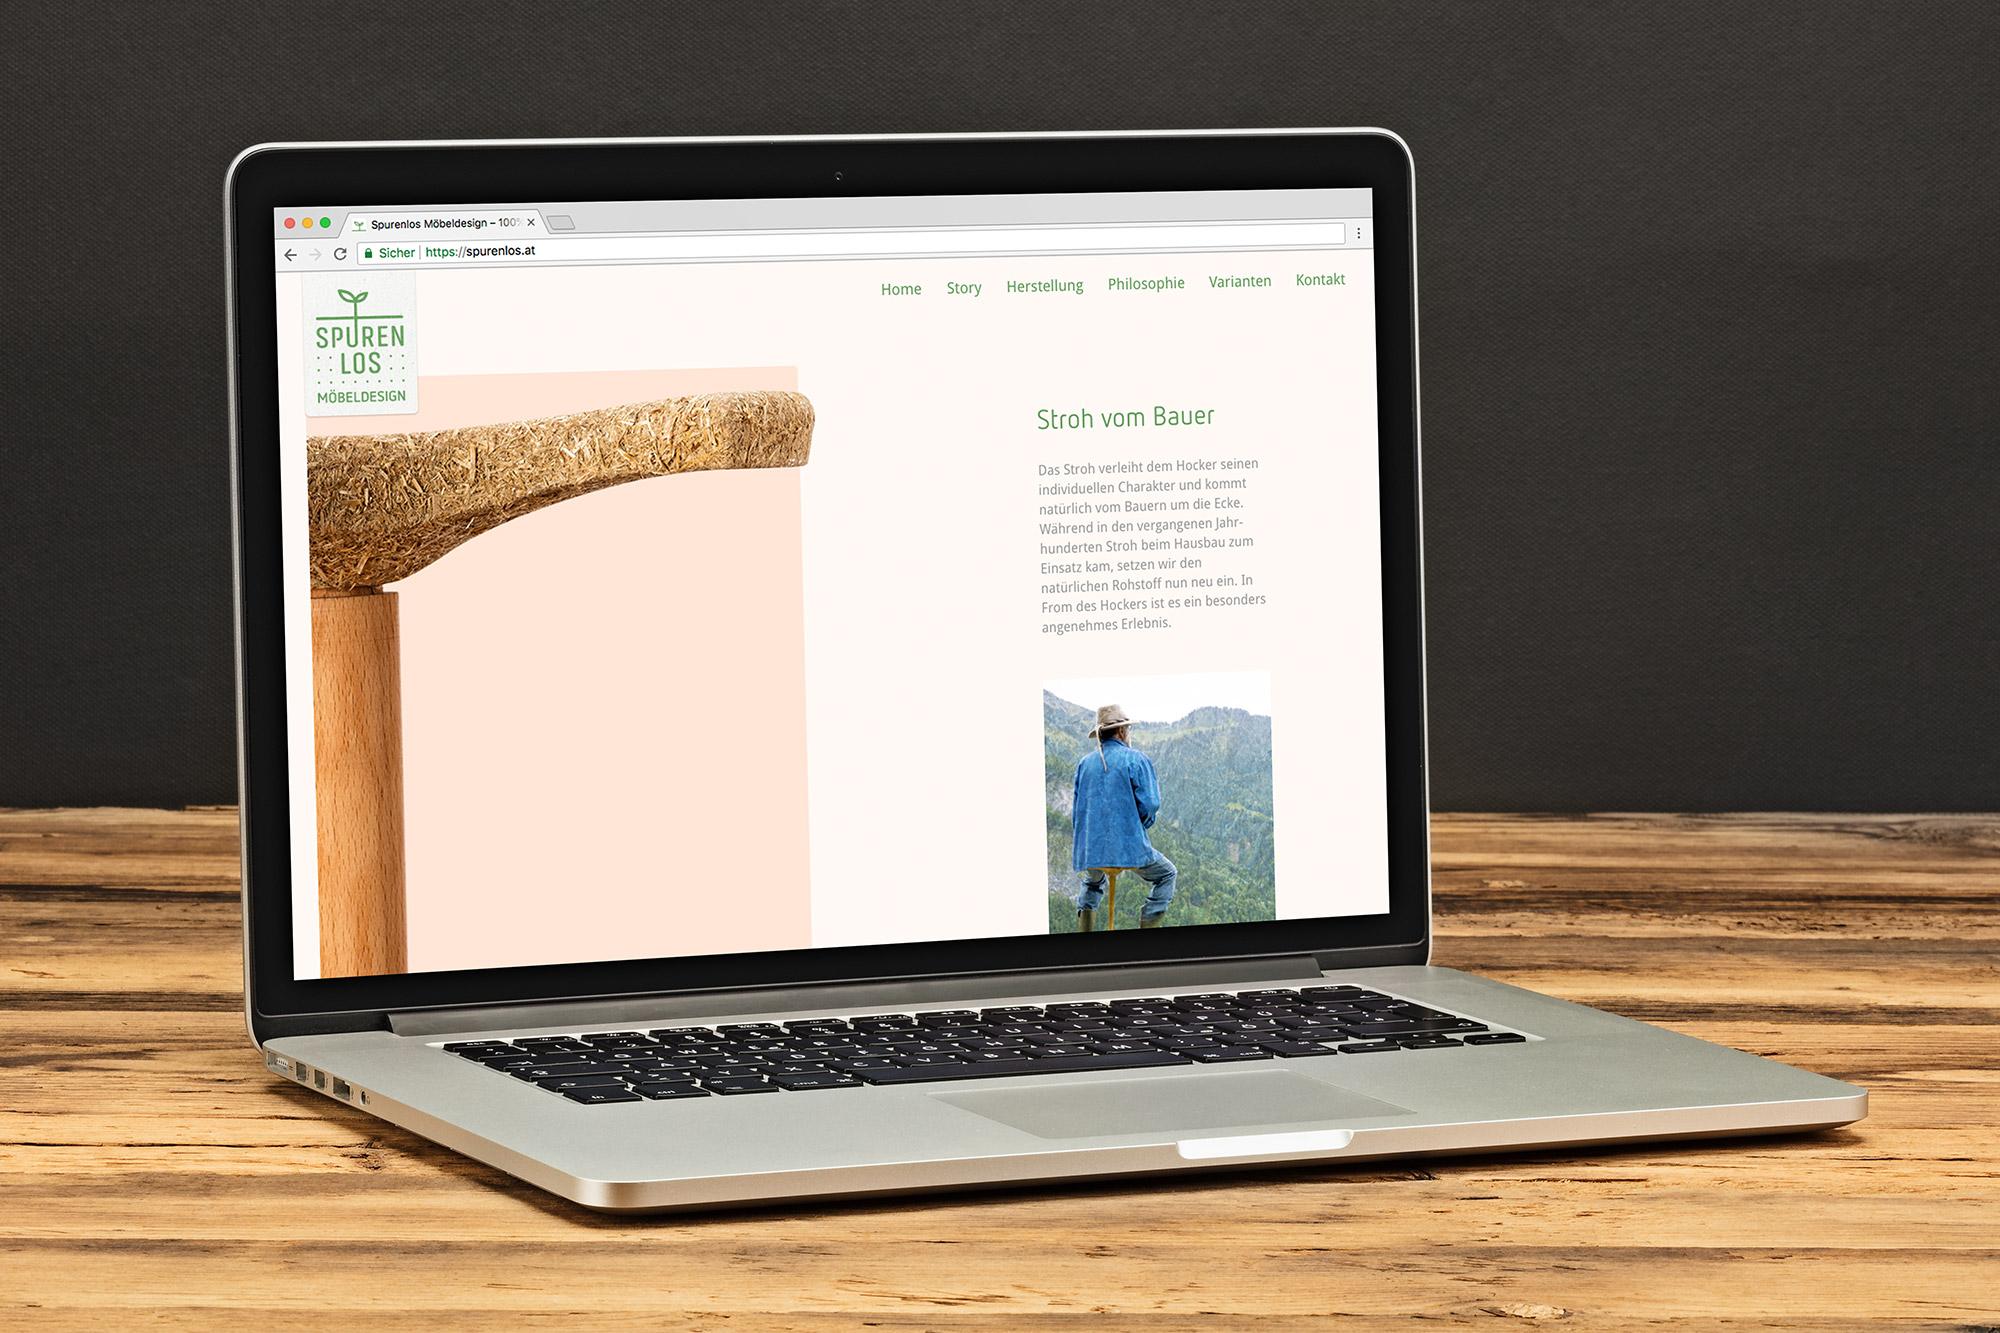 Laptop mit Spurenlos.at Website